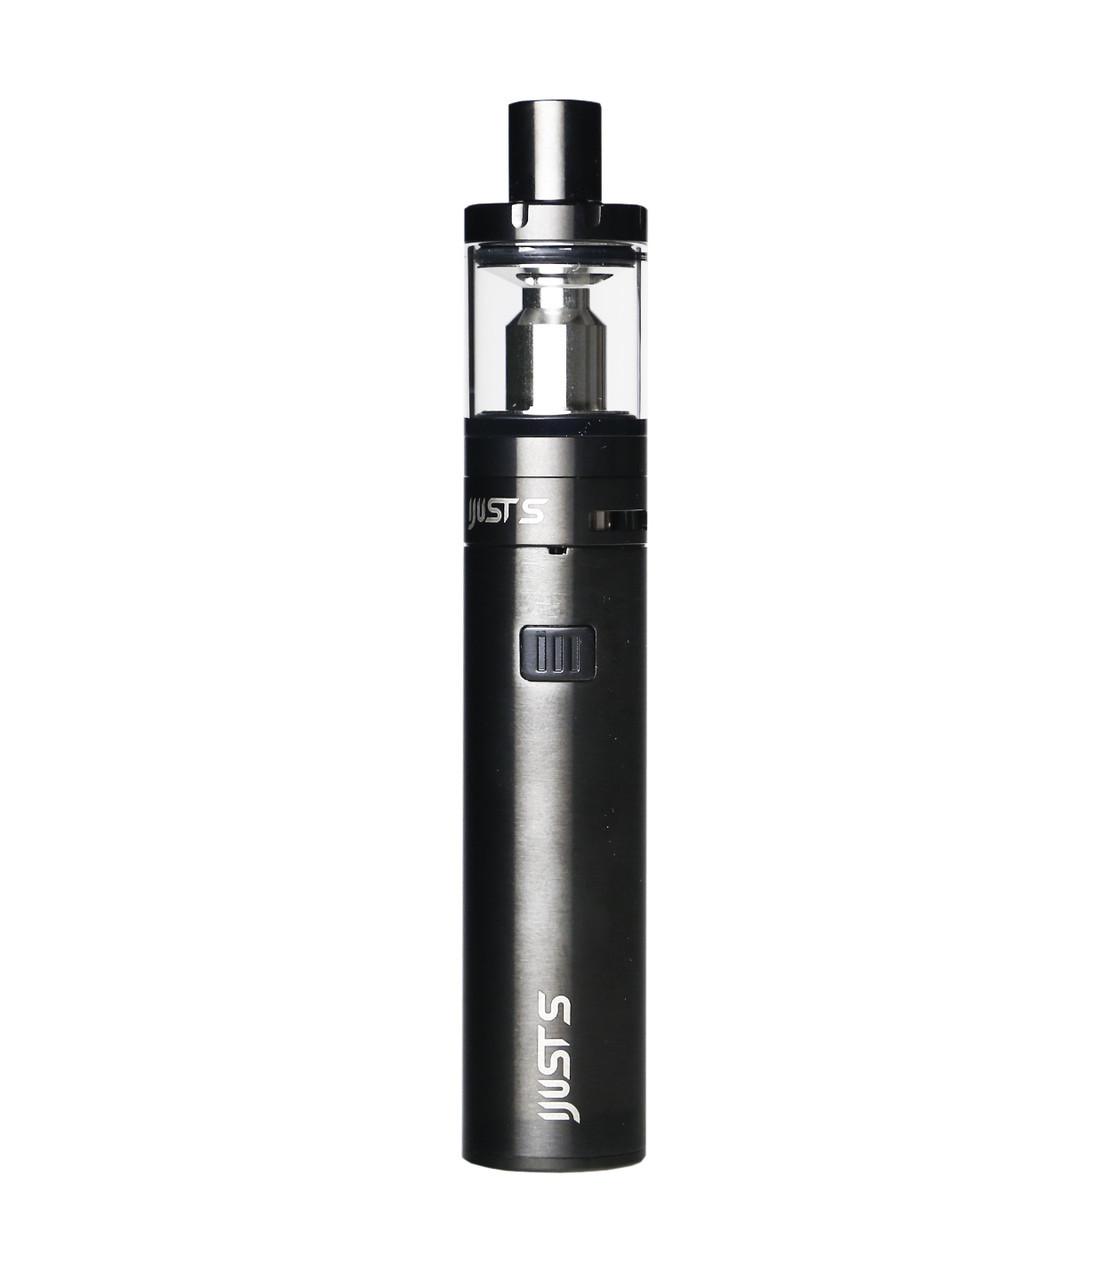 Электронная сигарета Eleaf ijust S 3000 mAh, кальян vape, вейп, вэйп. Айджаст